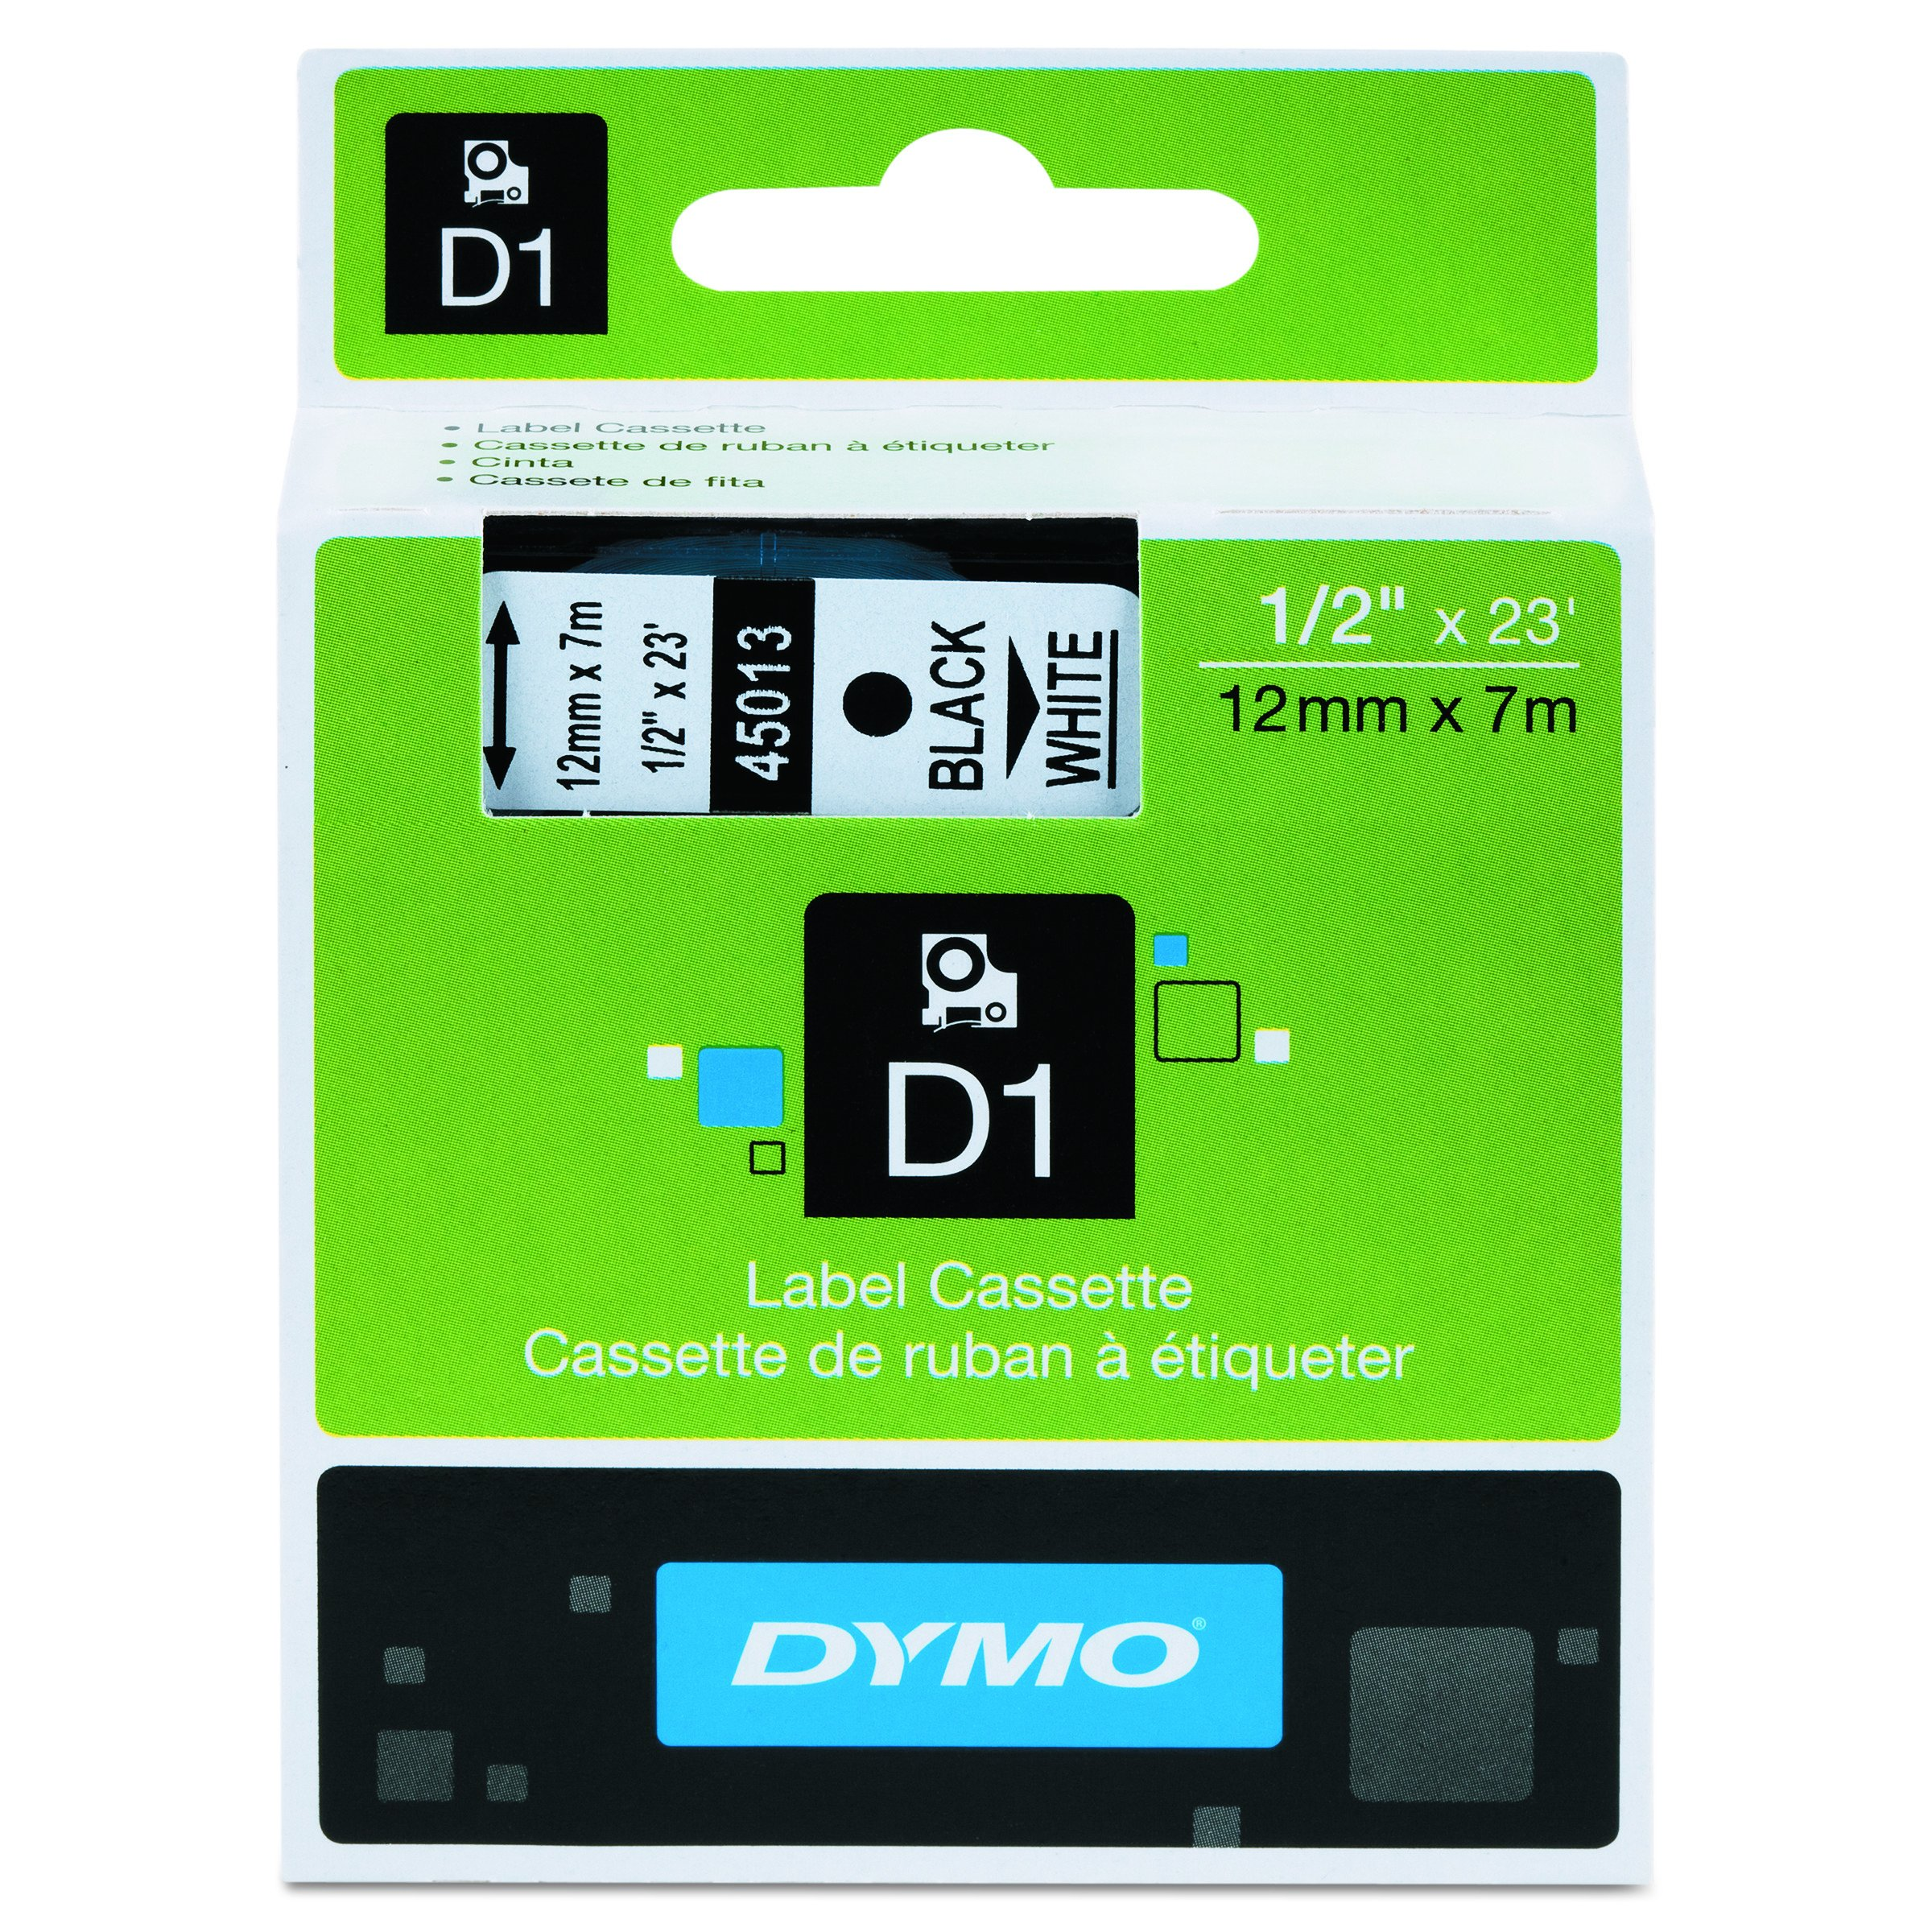 DYMO Standard D1 45013 Labeling Tape ( Black Print on White Tape , 1/2'' W x 23' L , 1 Cartridge), DYMO Authentic